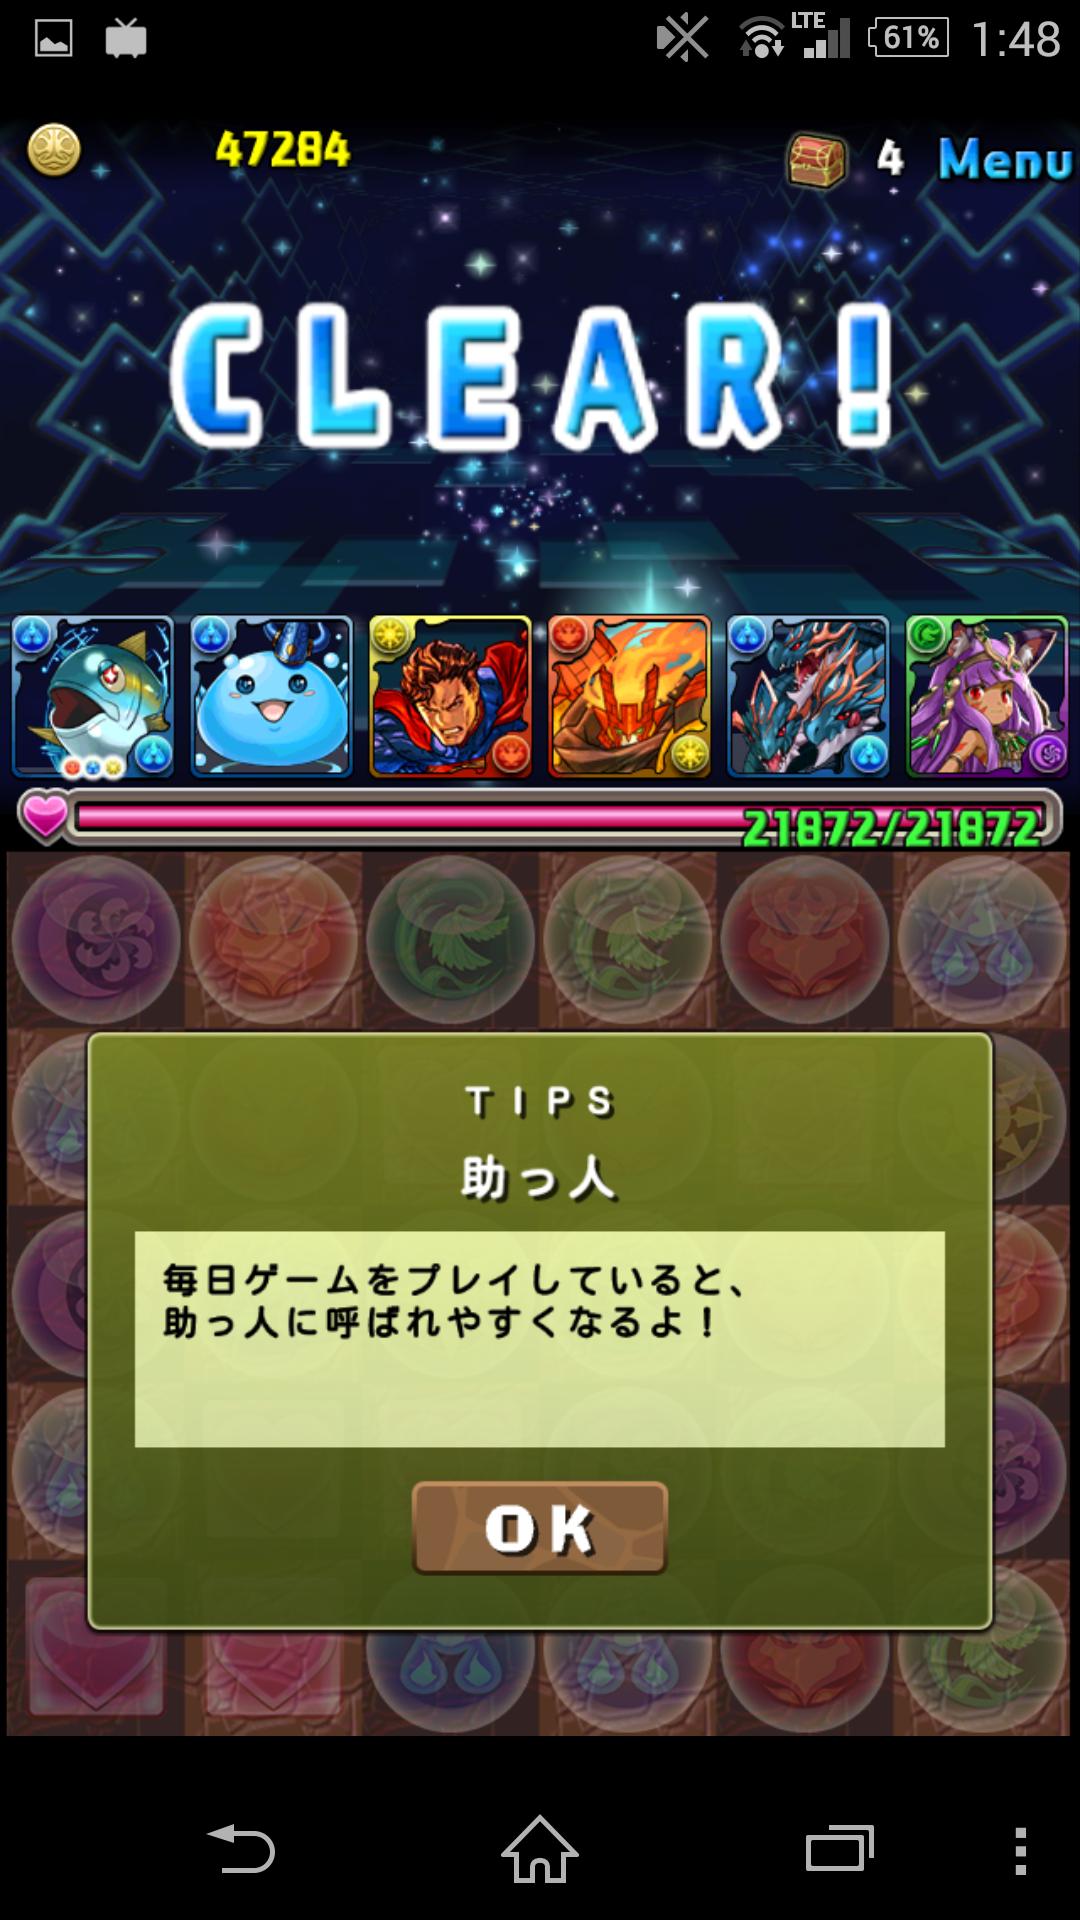 Screenshot_2014-11-13-01-48-54.png